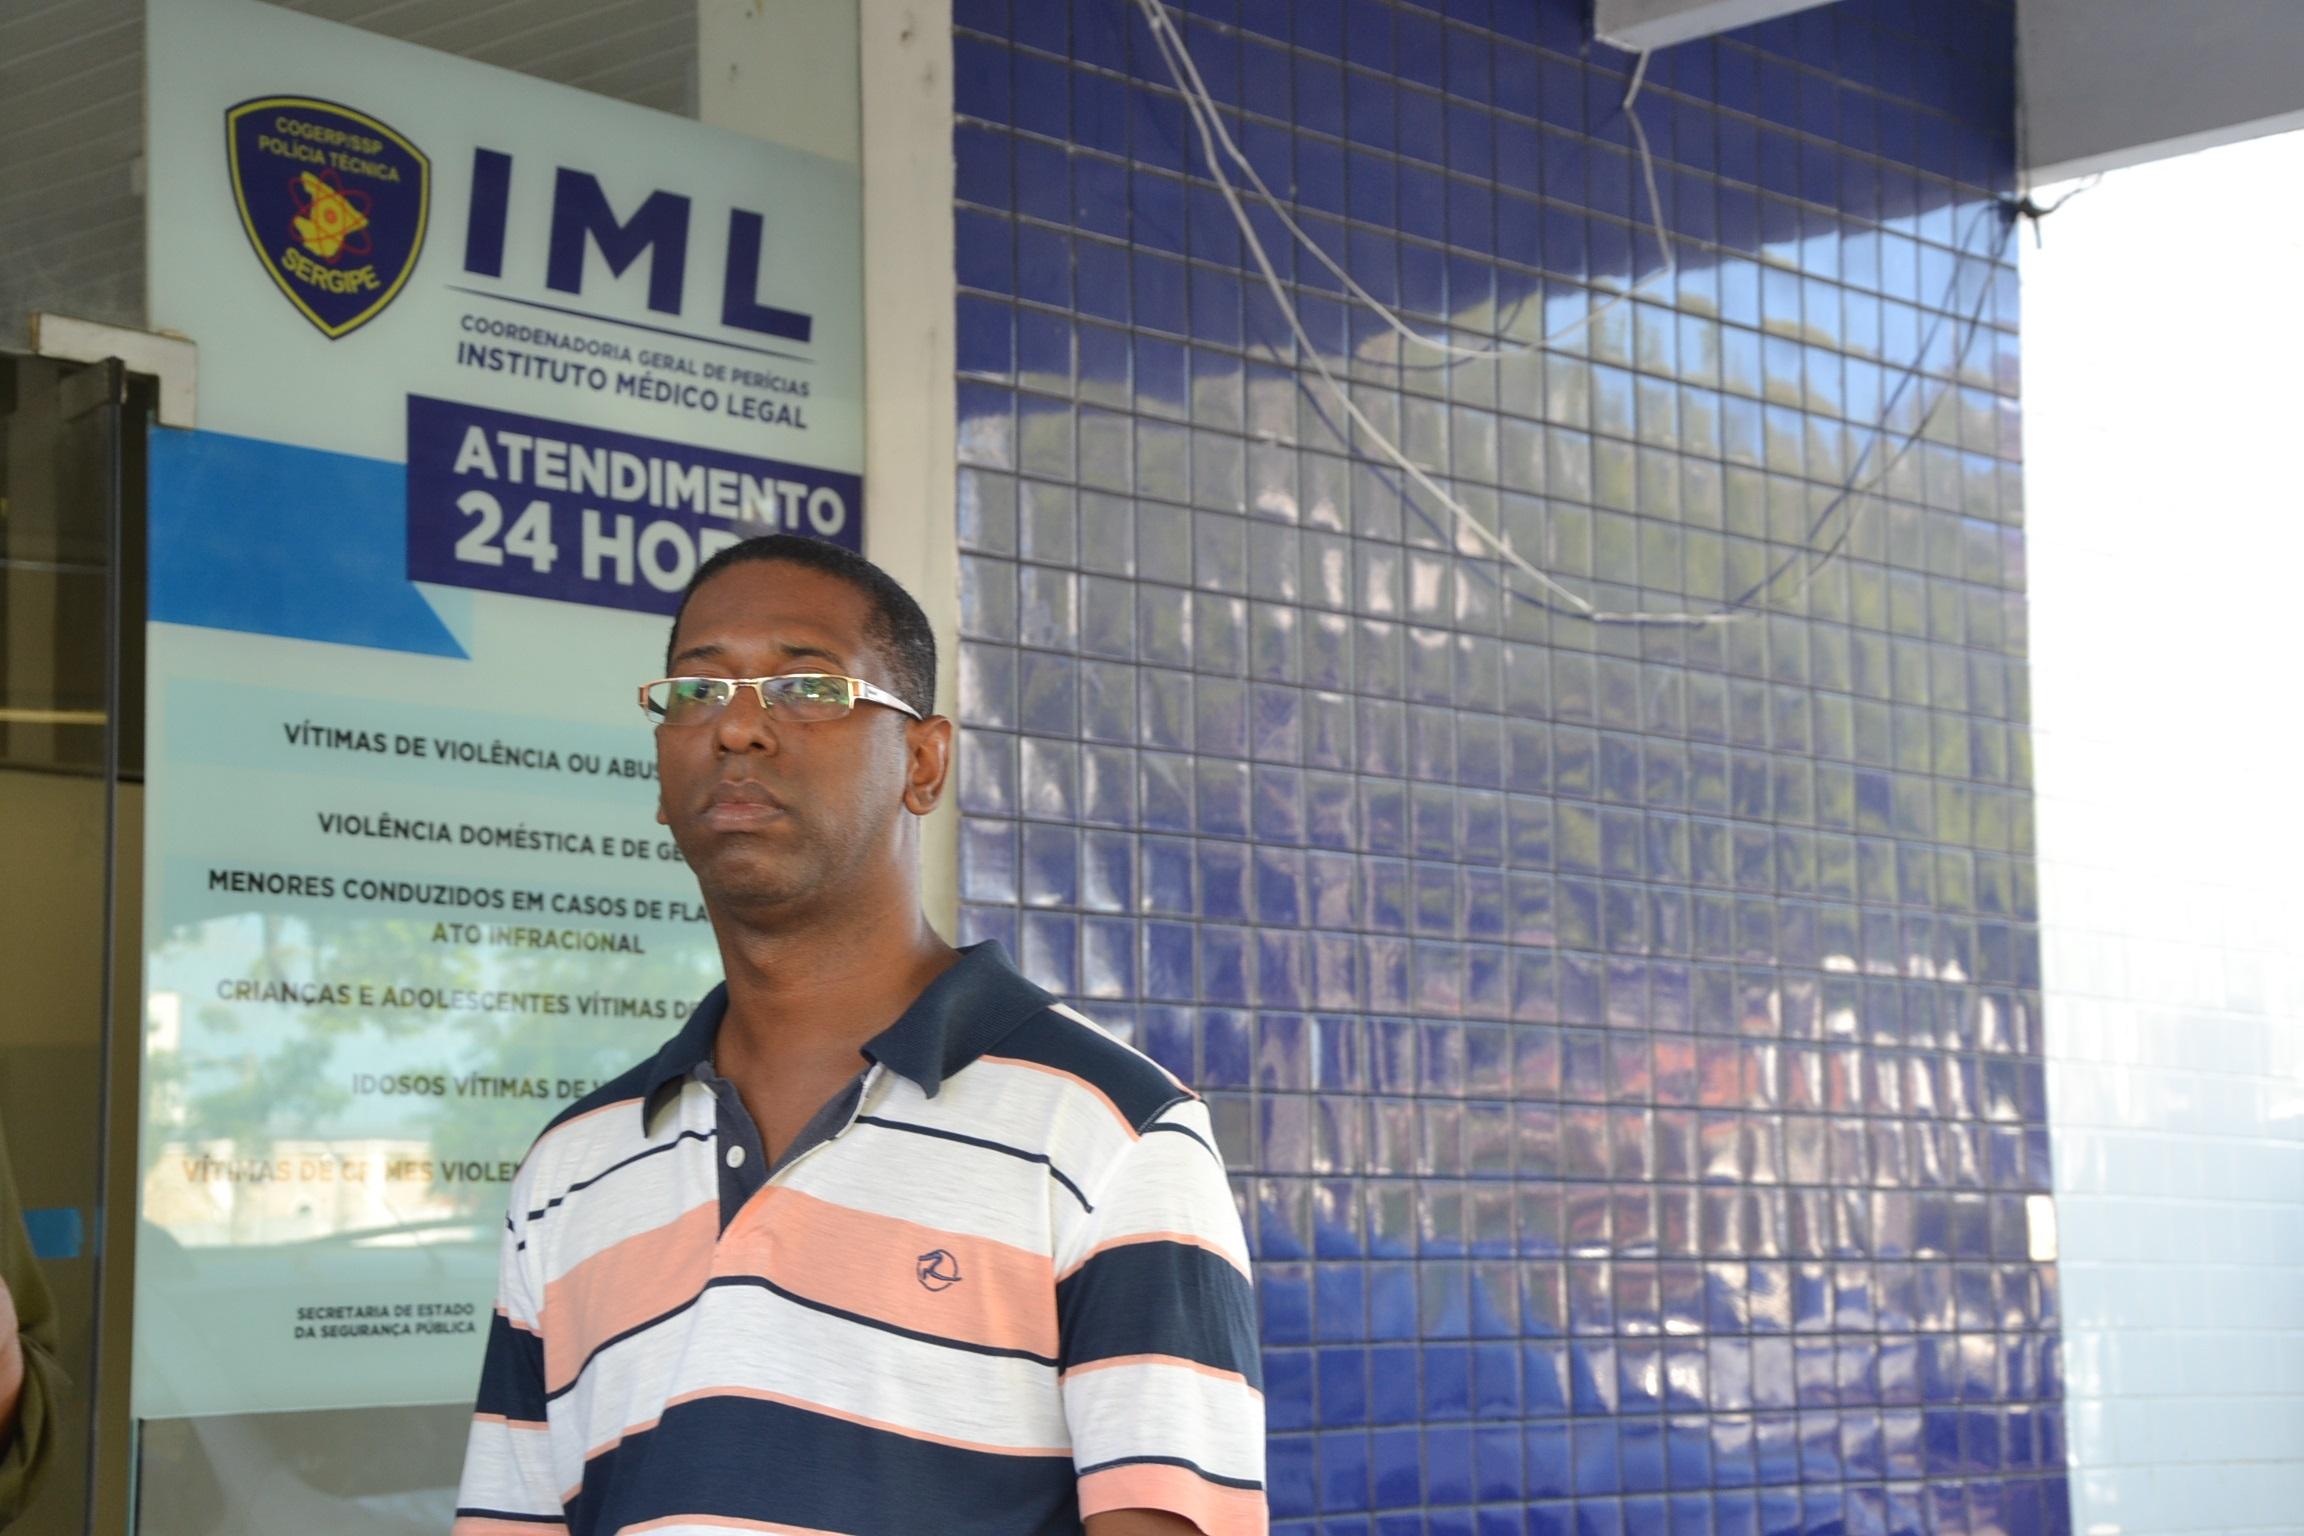 Interior designer shot dead in Civil Police operation in Sergipe